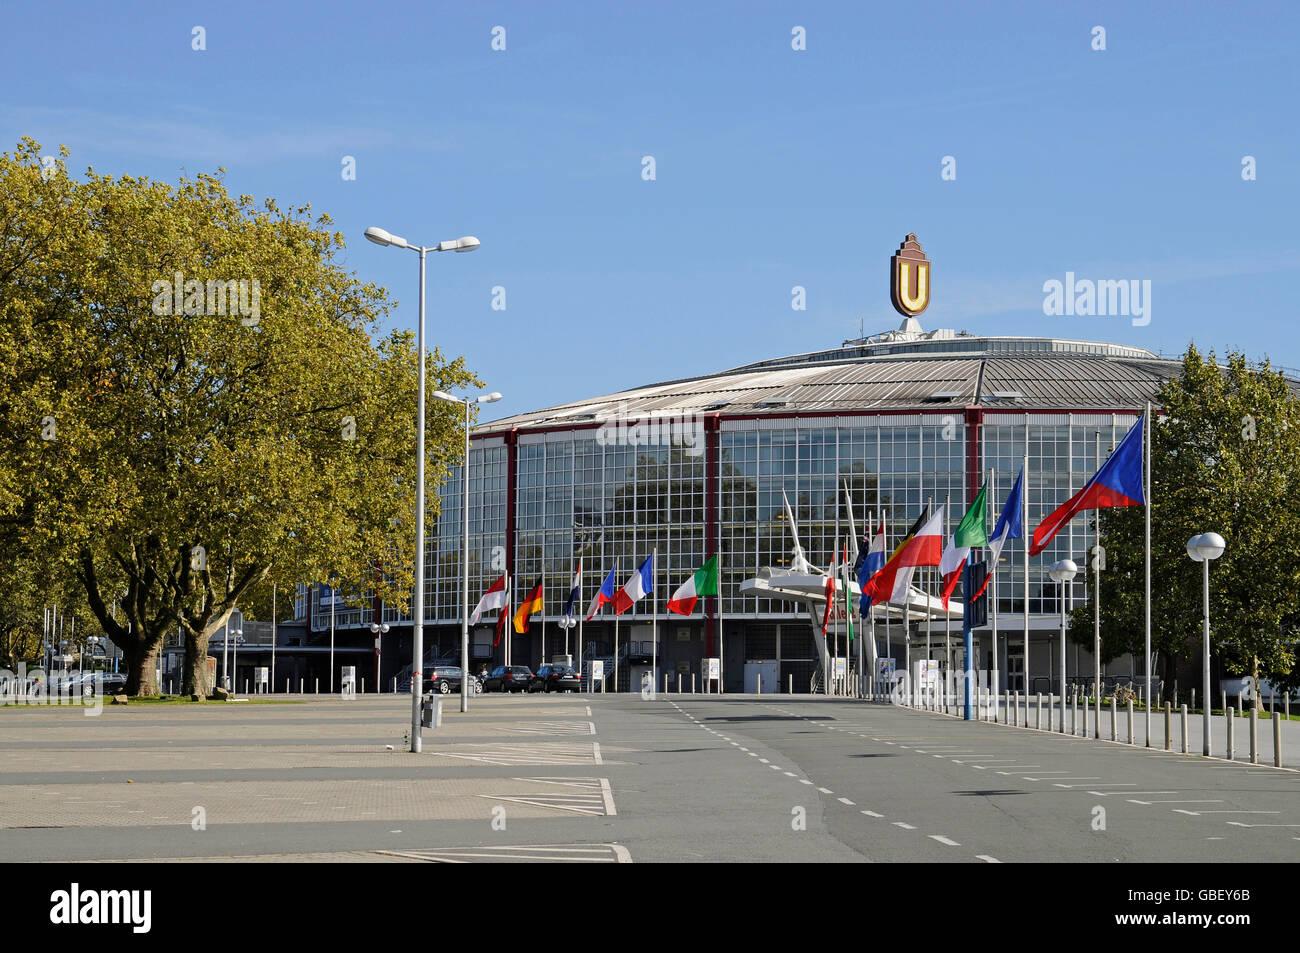 Westfalenhallen, Dortmund, North Rhine-Westphalia, Germany / Westfalenhalle - Stock Image